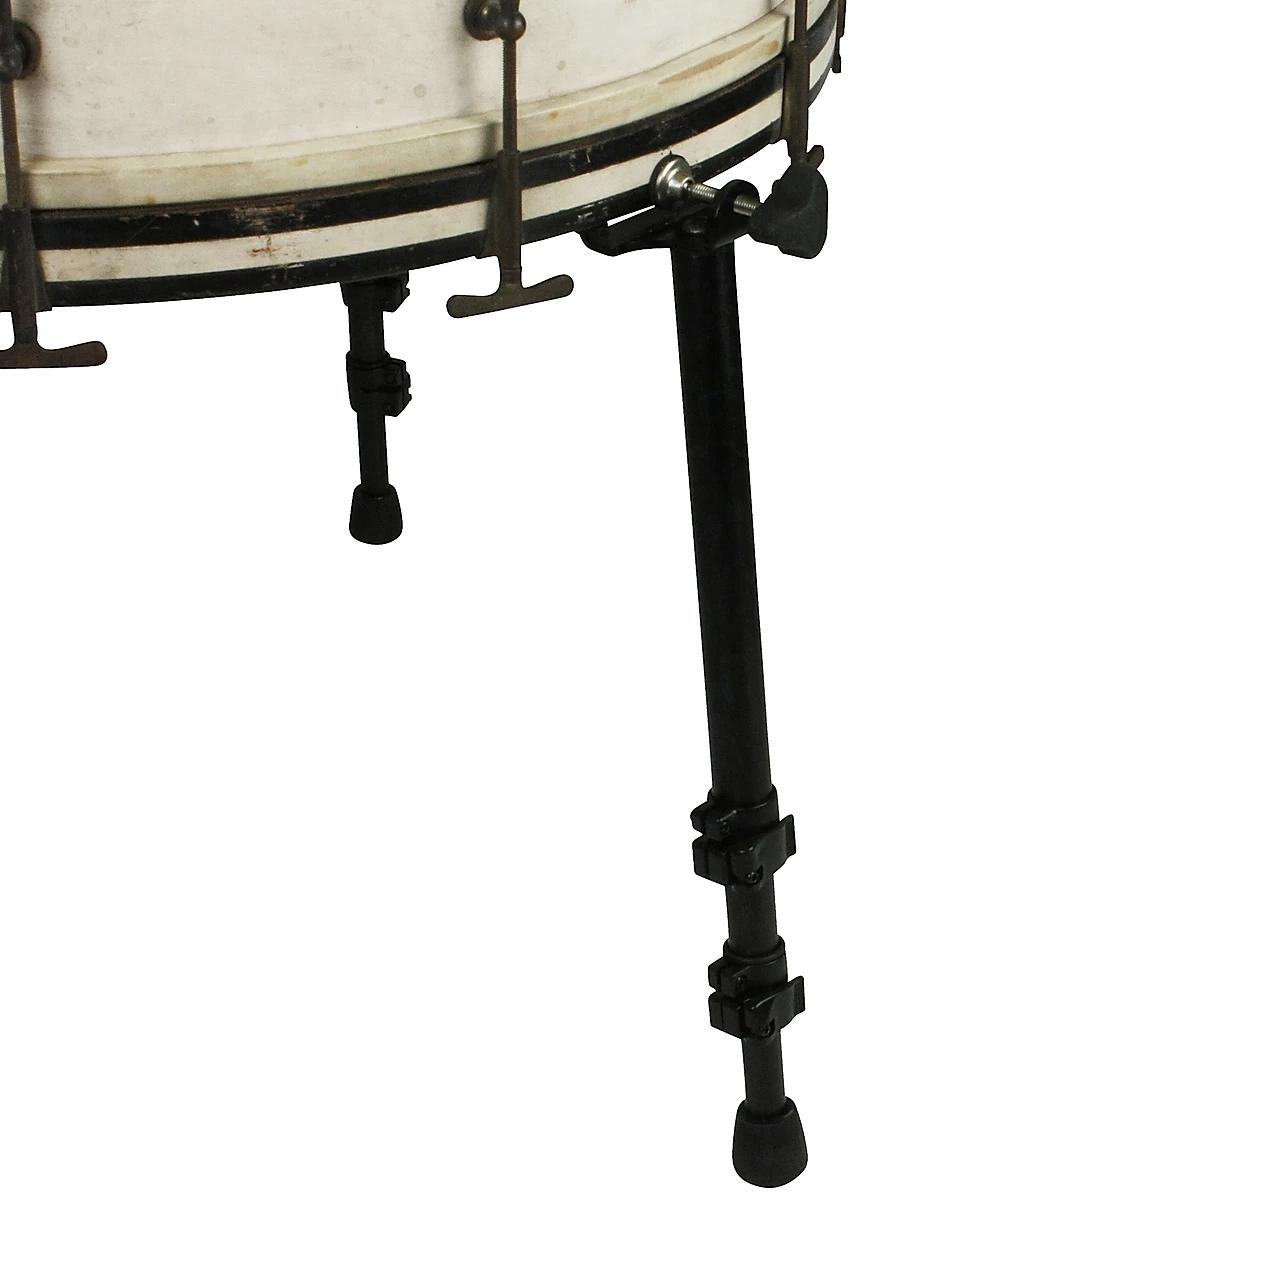 Black Swamp Percussion MLEG3 Multilegs for Bassdrum